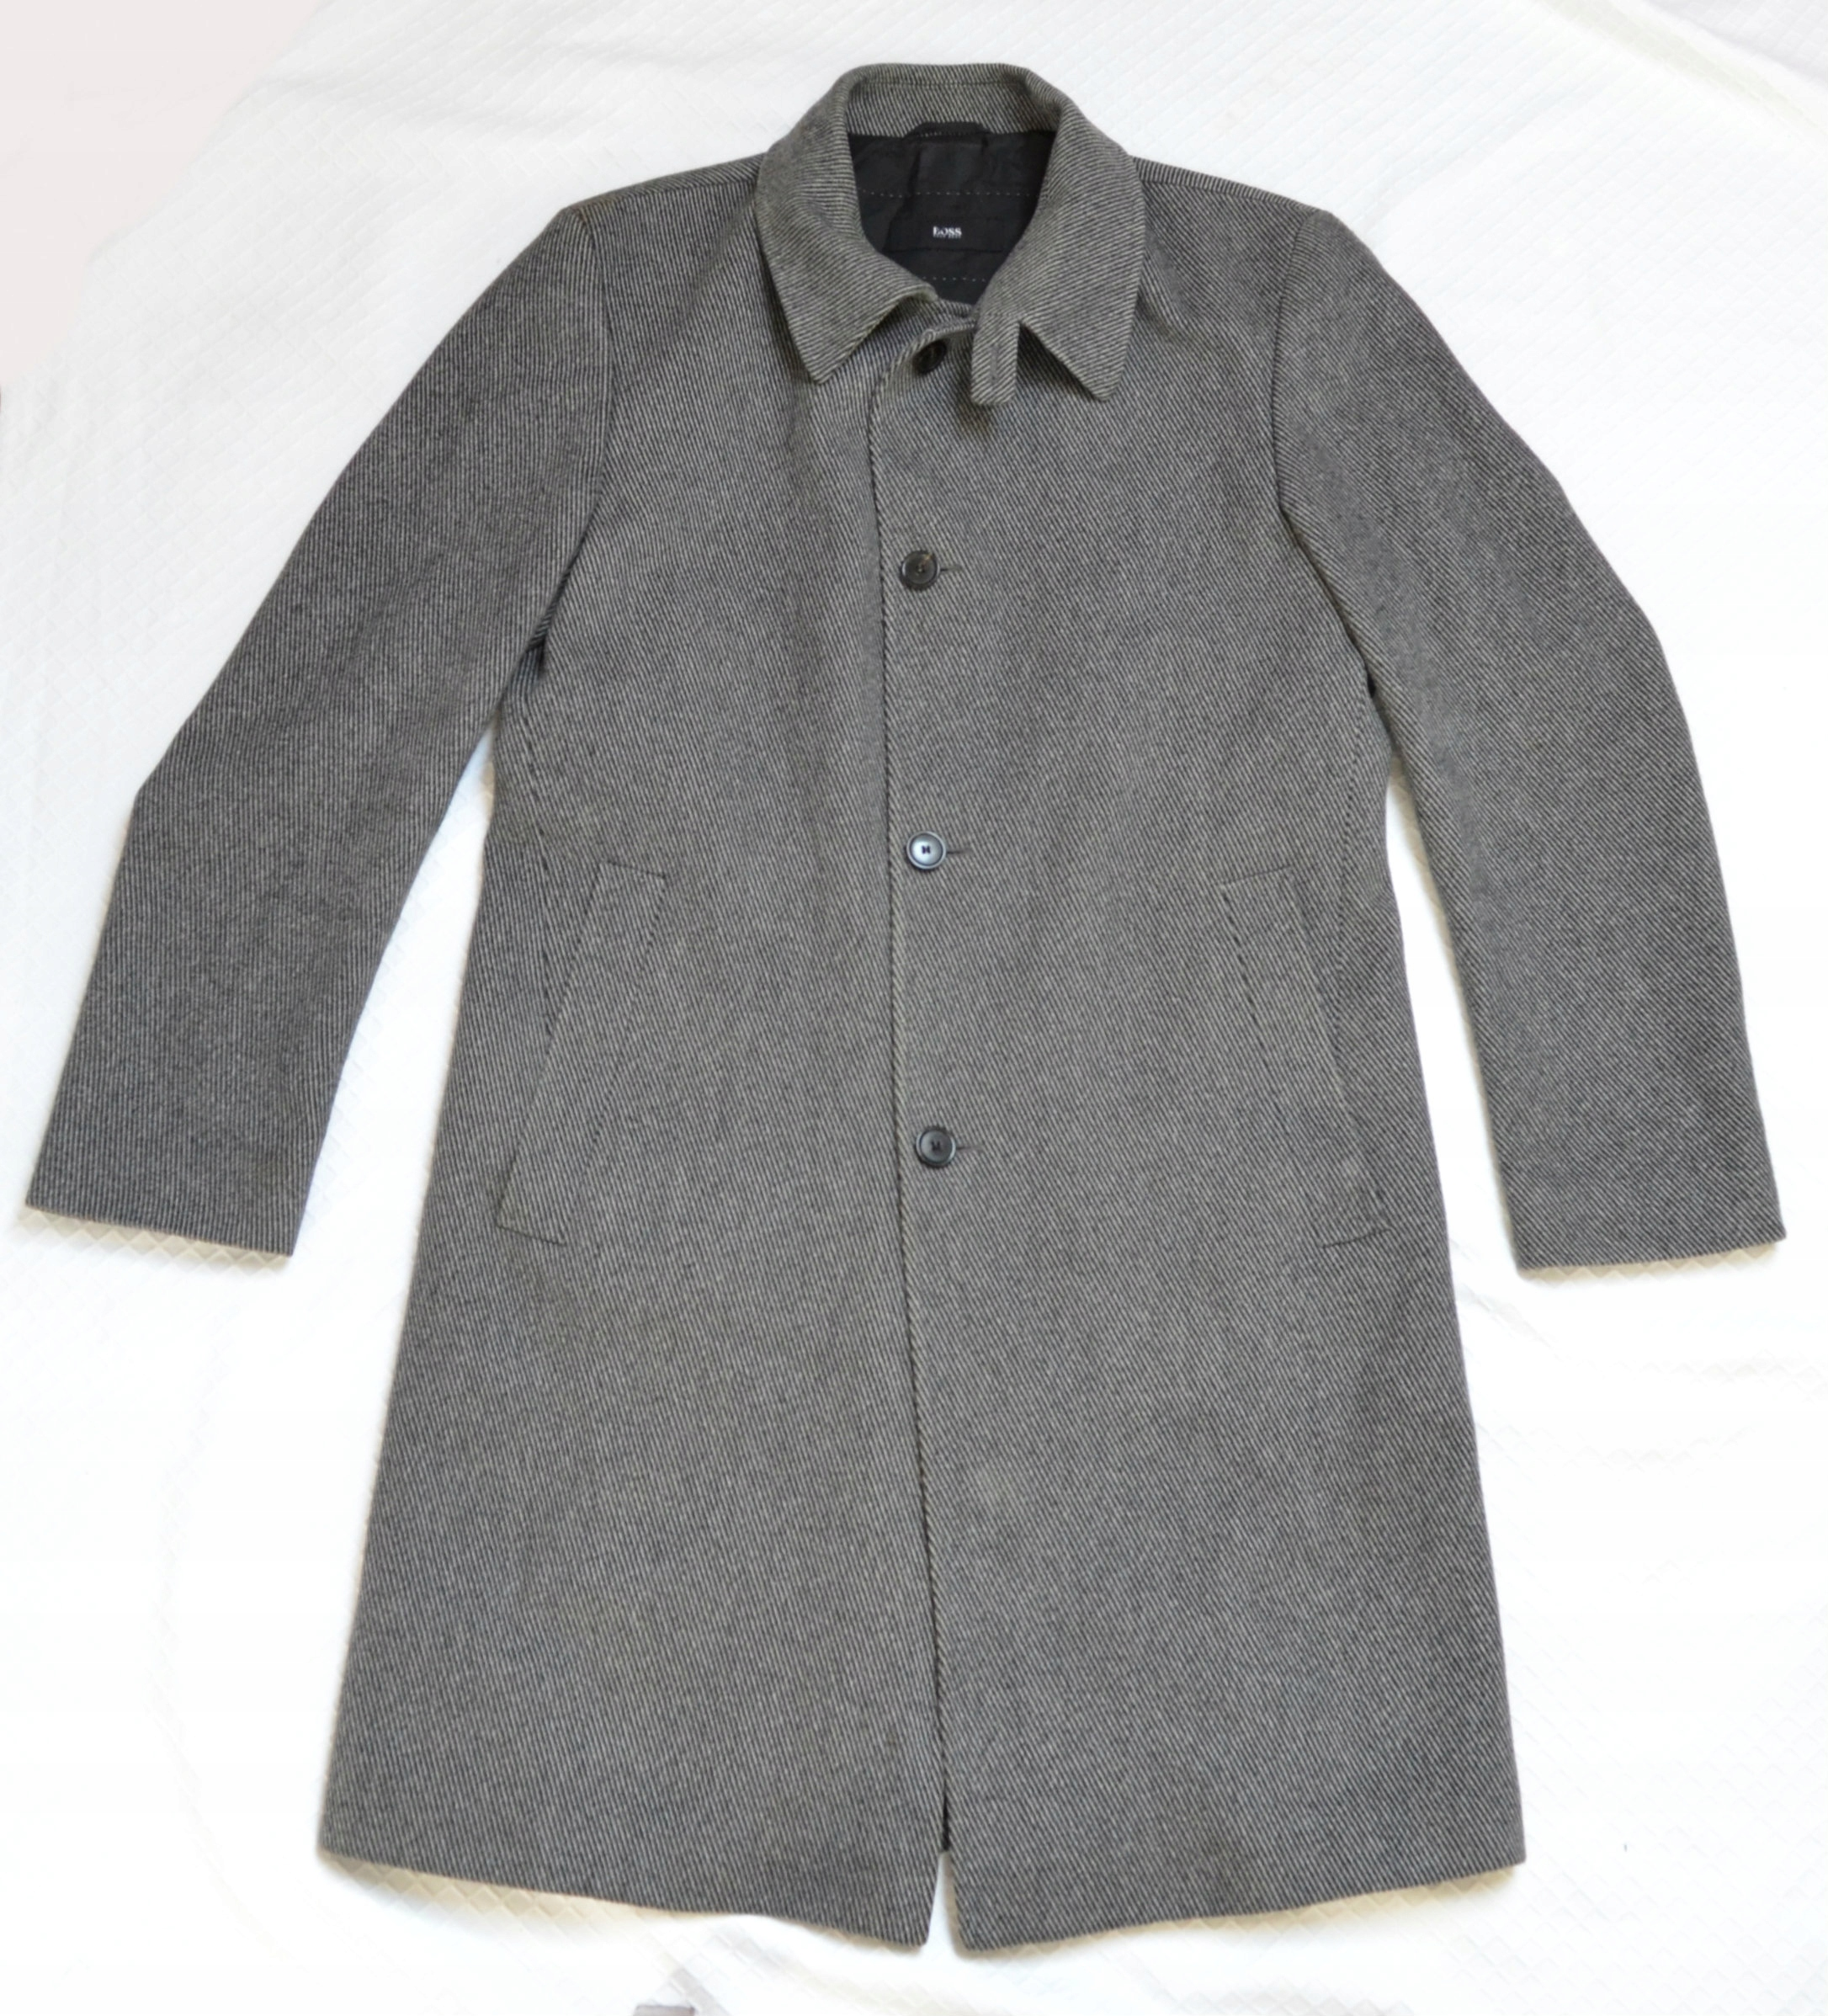 9b8a92d970860 Hugo Boss płaszcz męski XL 42 kaszmir i wełna bdb - 7696501811 ...